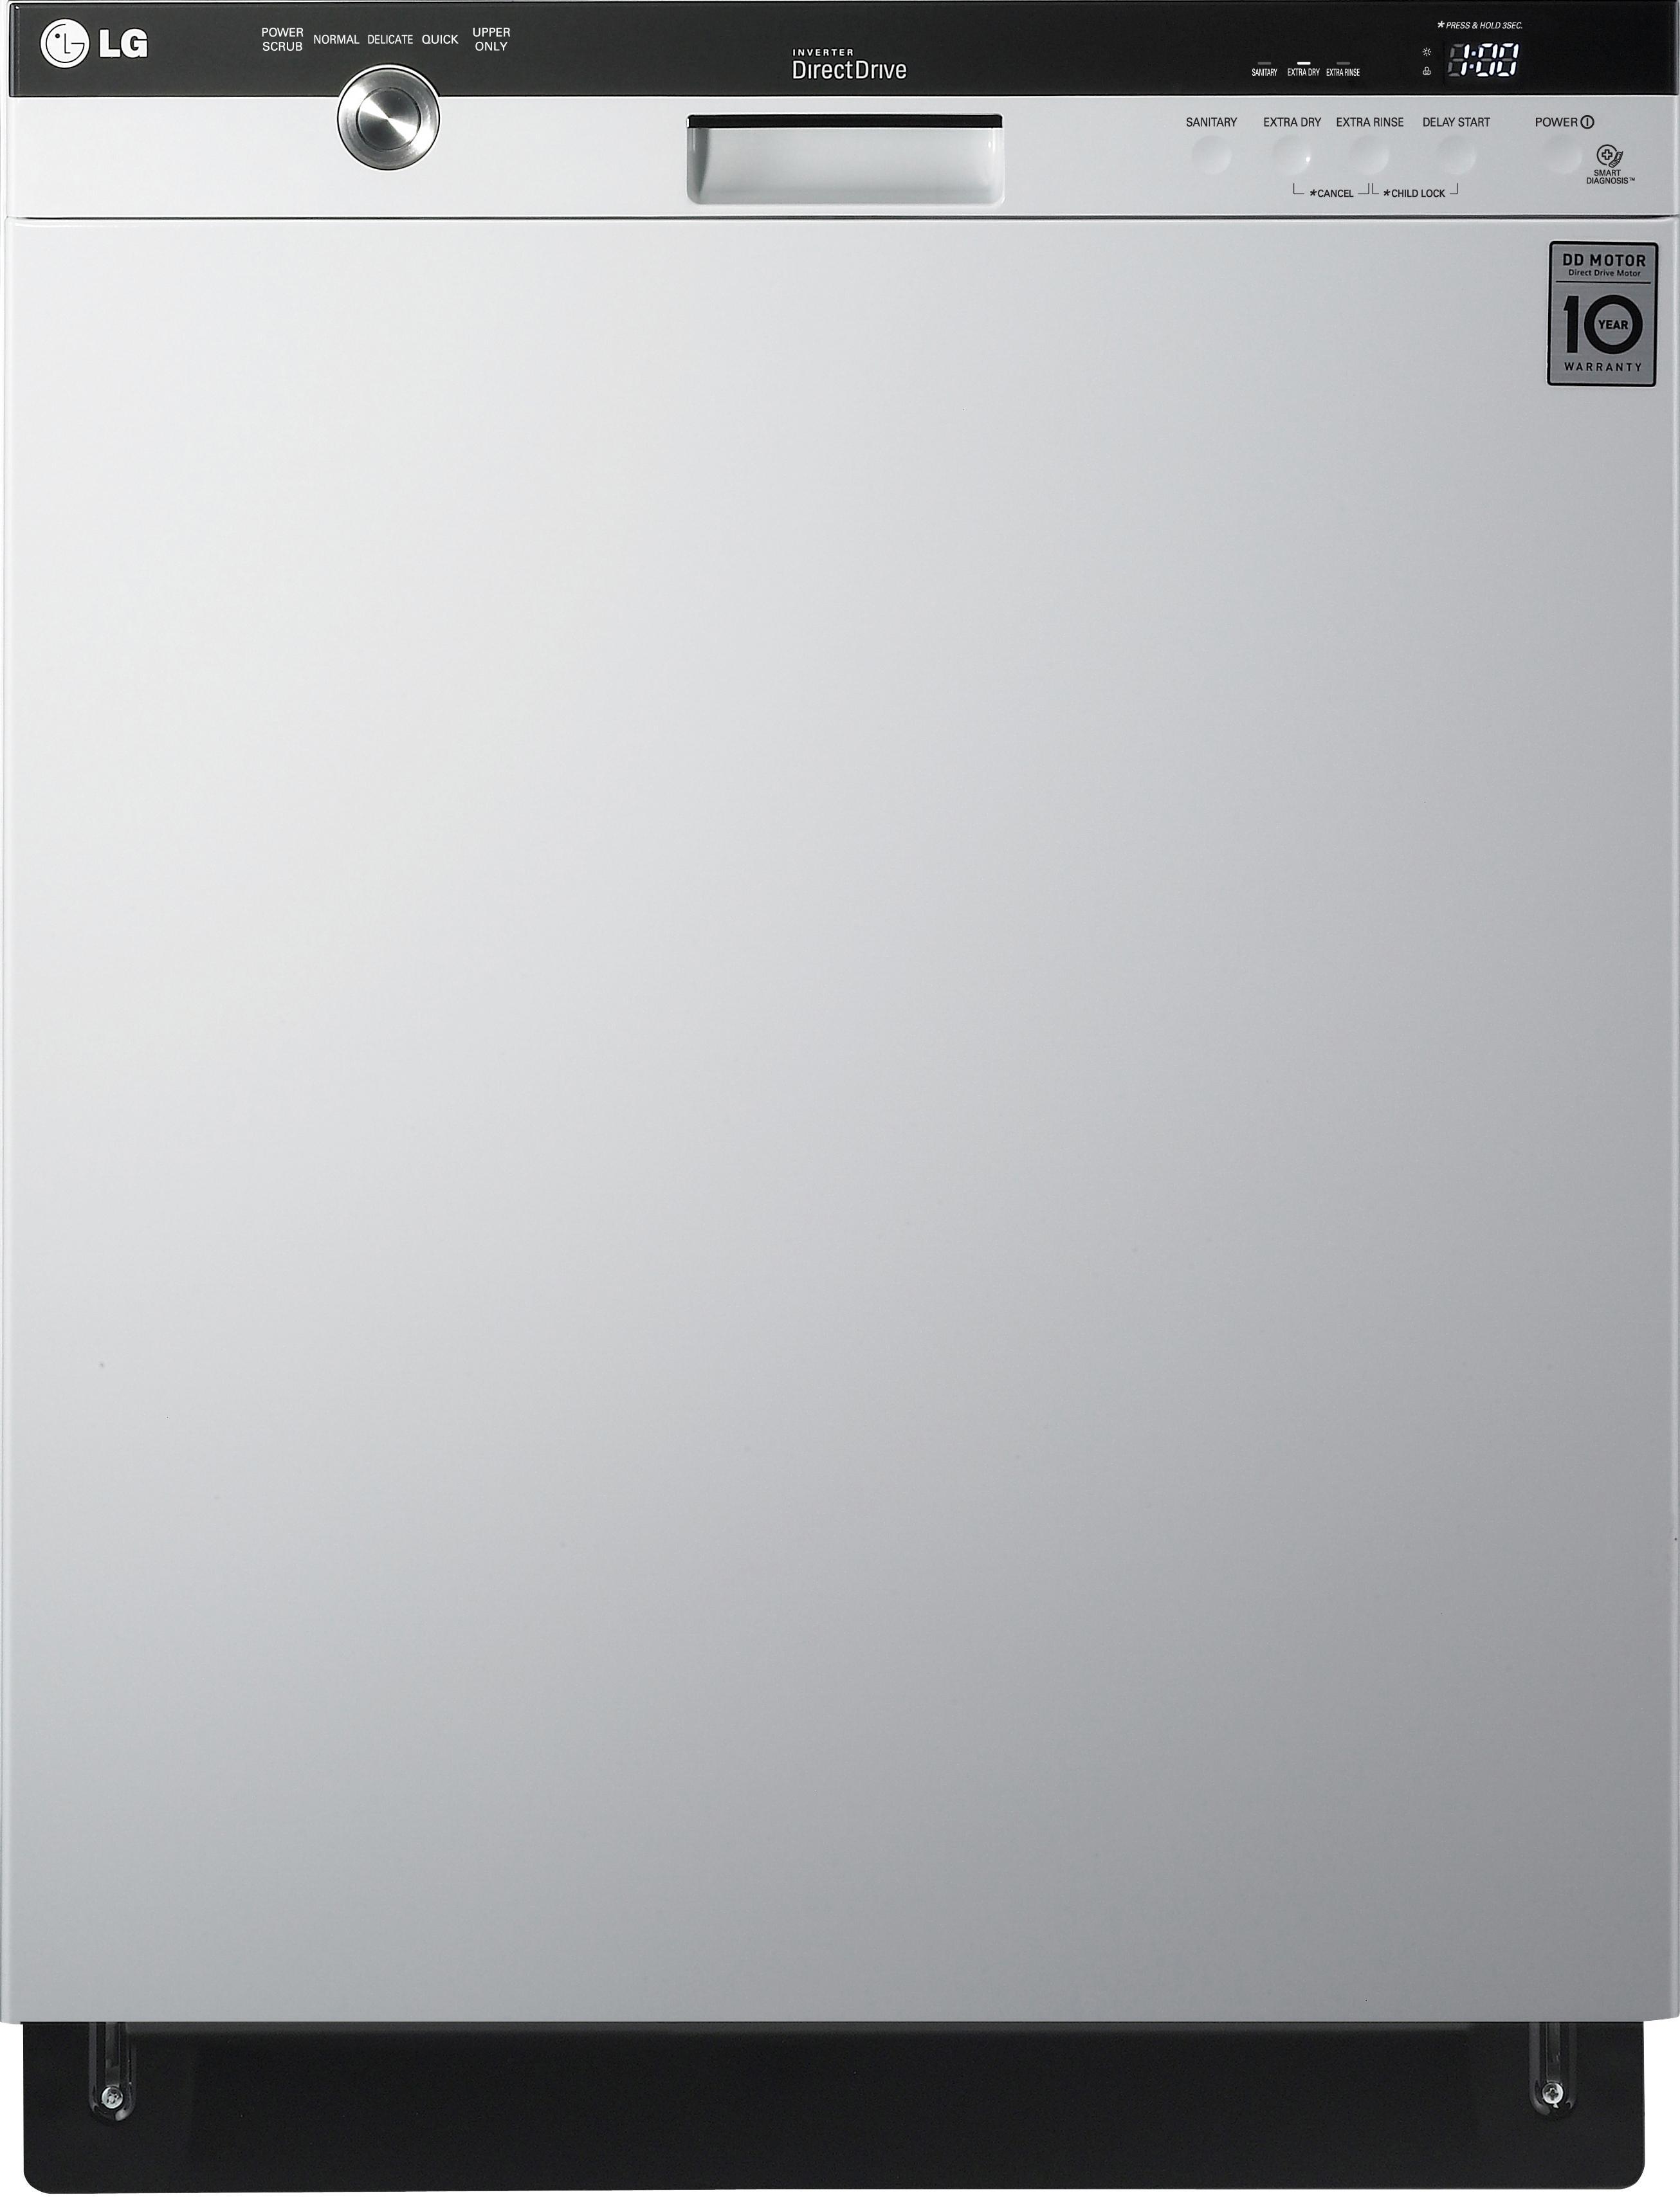 "LG Appliances Dishwashers 24"" Built-In Dishwasher - Item Number: LDS5540WW"